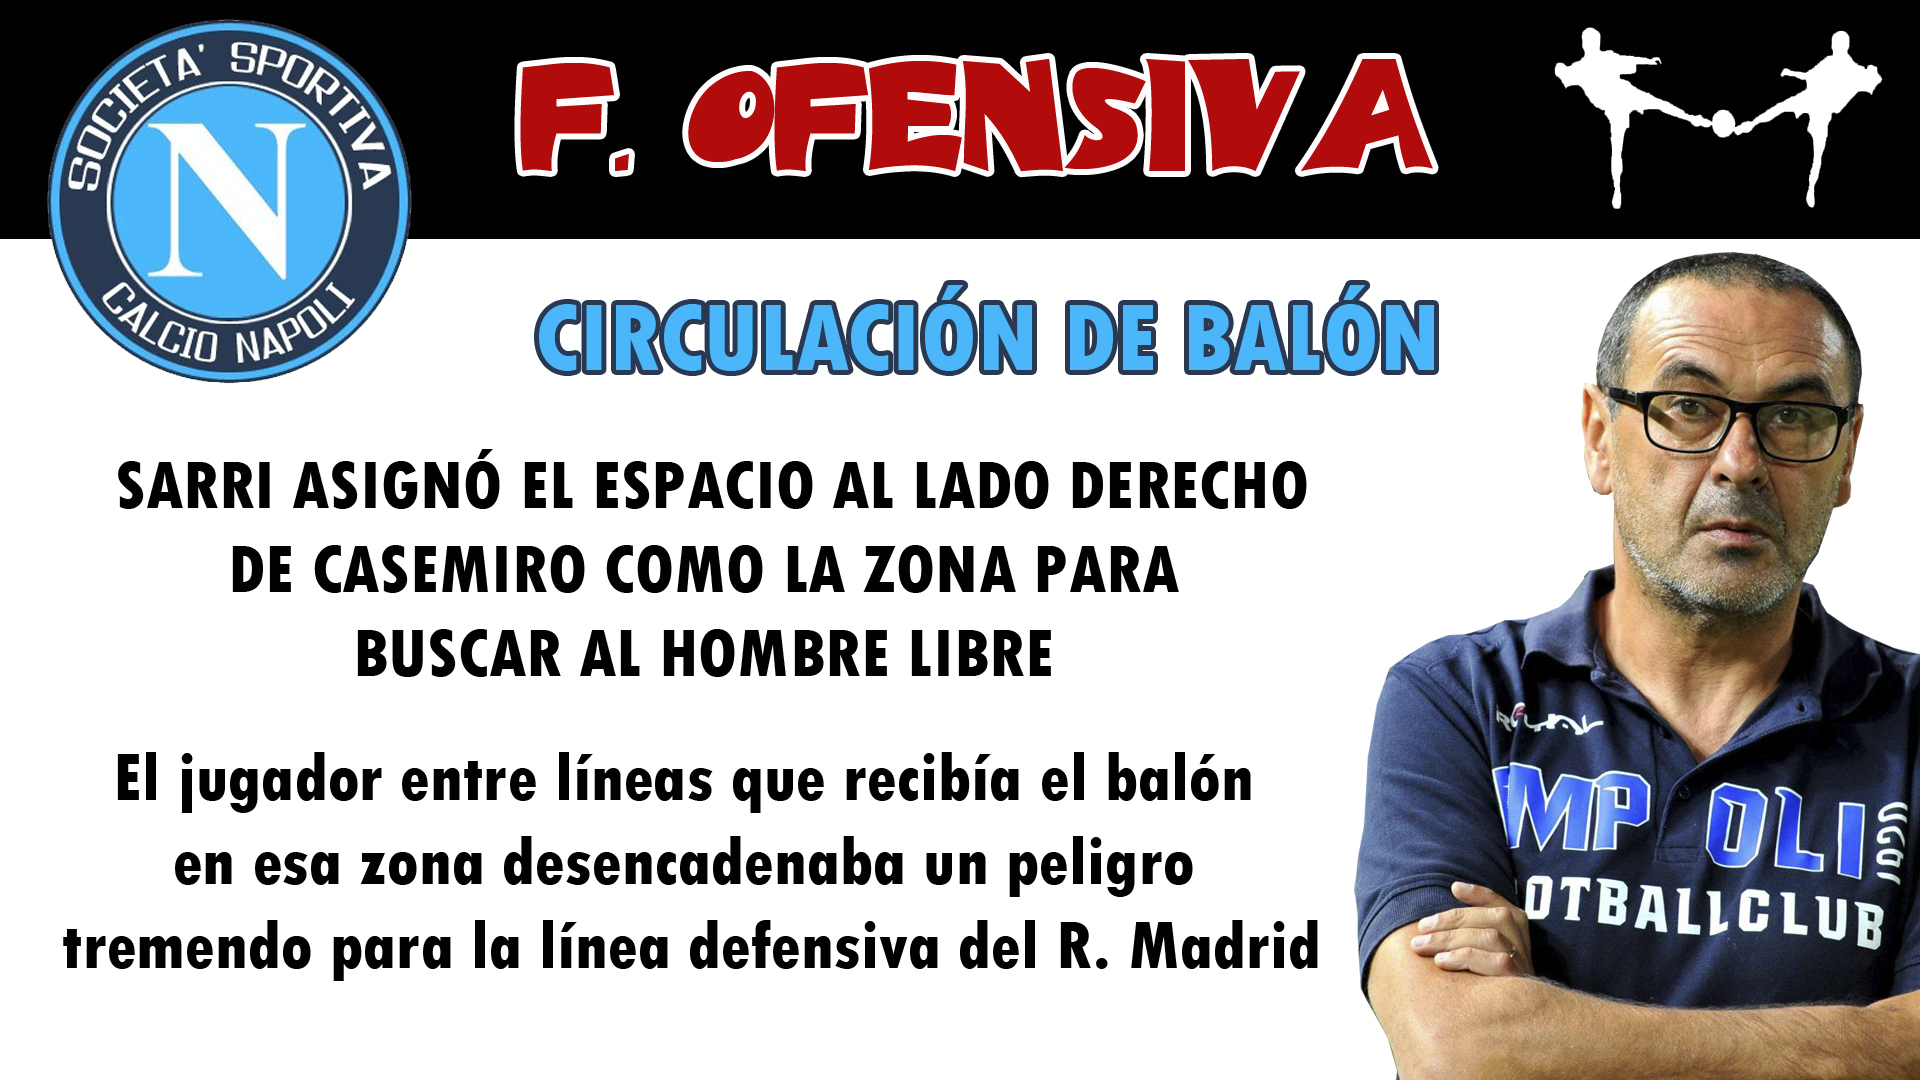 futbolcarrasco napoli champions analisis tactico real madrid zidane